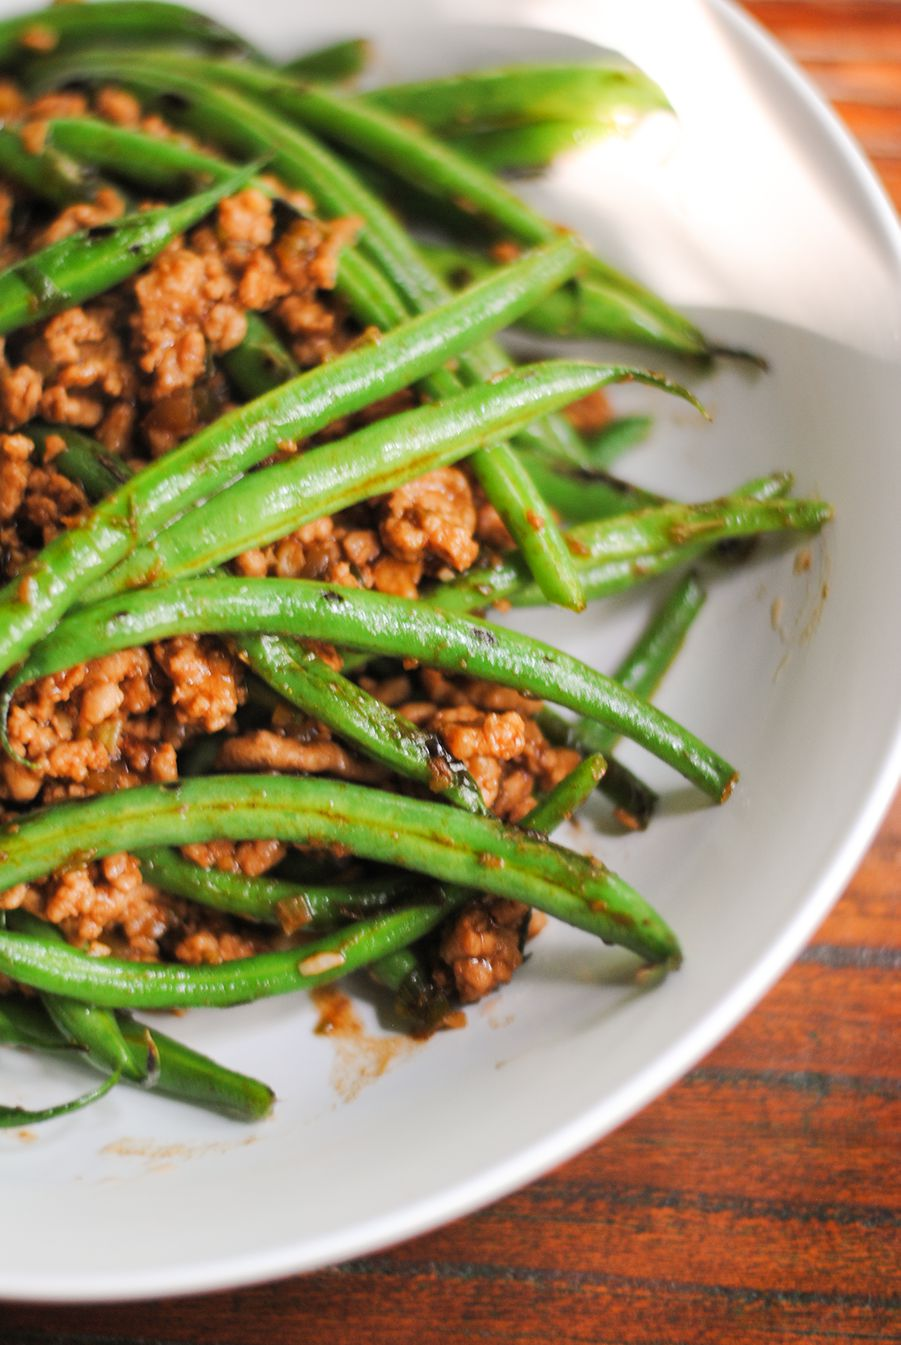 Stir-fried pork and green beans